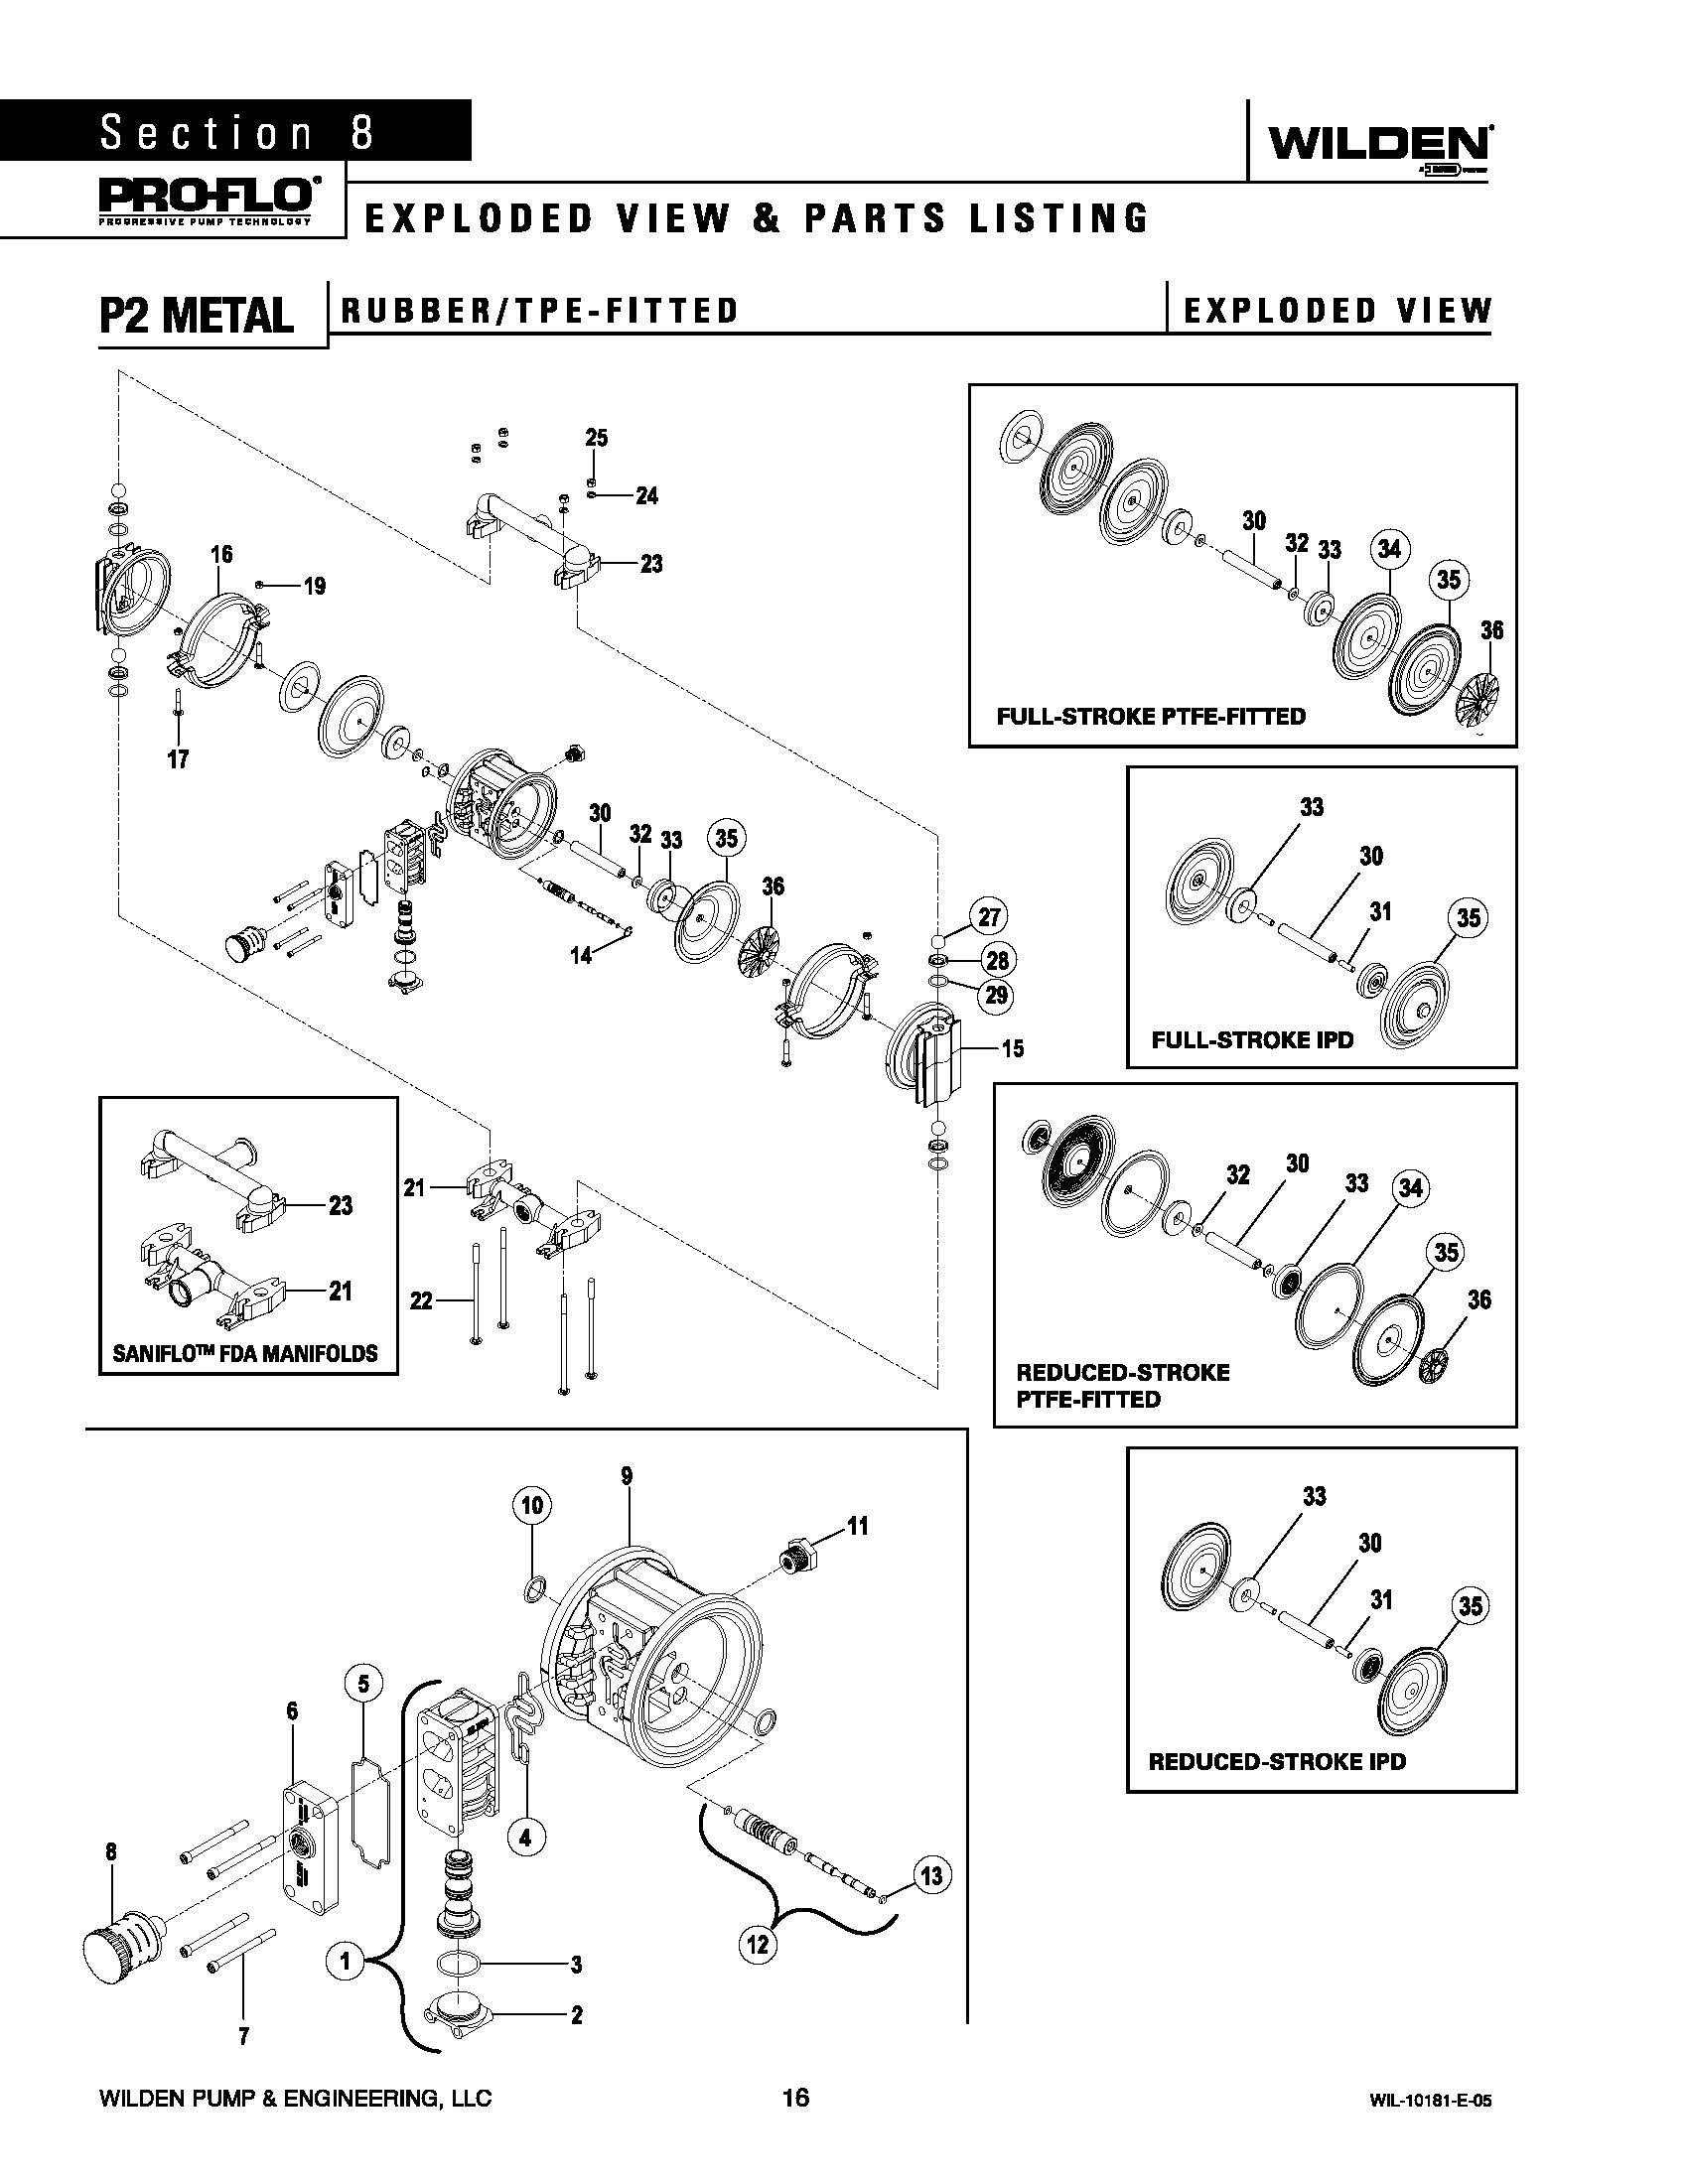 Wilden p2 original metal rubber tpe ptfe pumping solutions inc wilden p2 original metal rubber tpe ptfe sciox Image collections